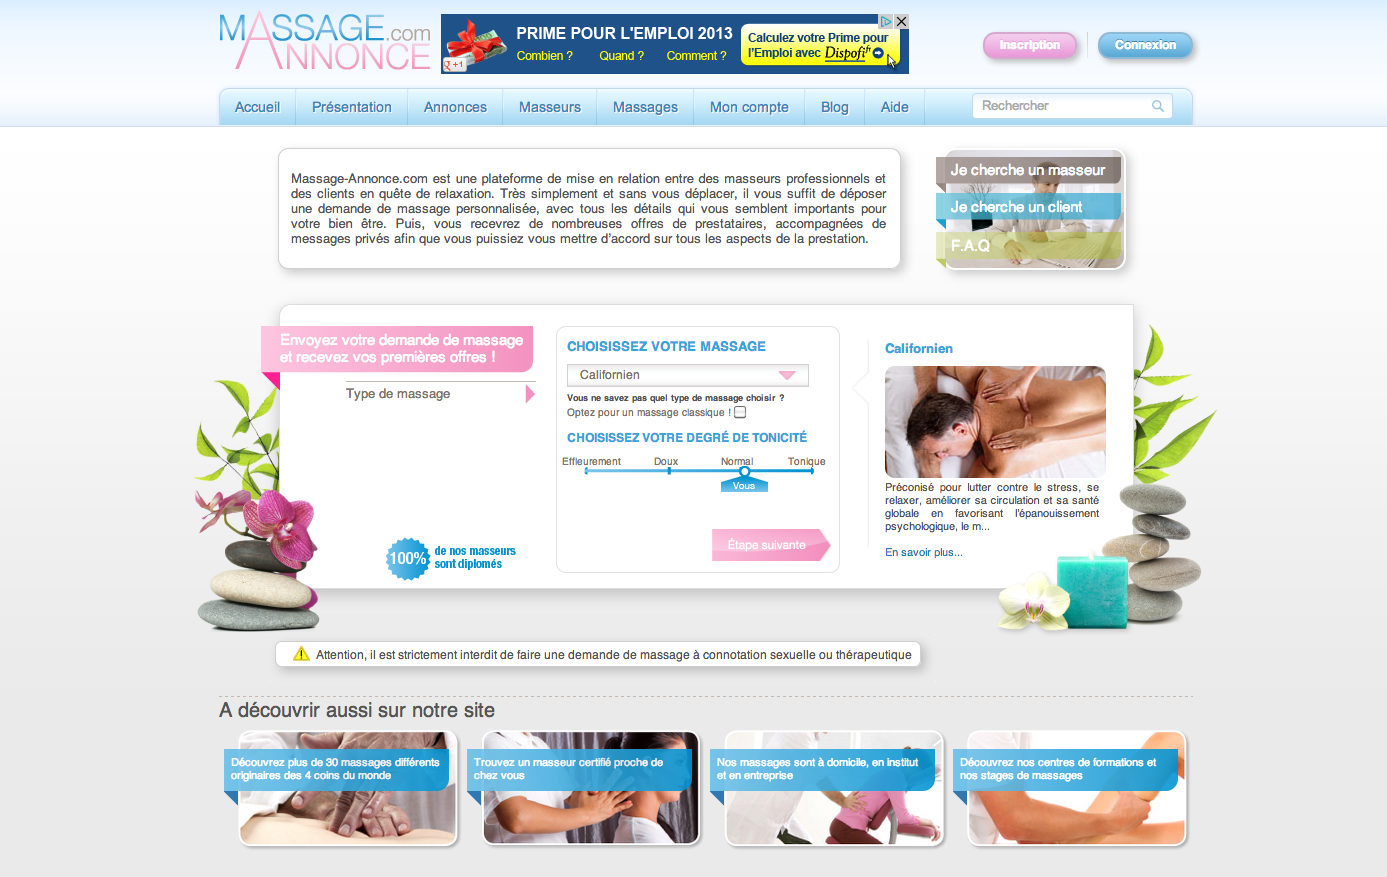 Le massage : un antidote au stress